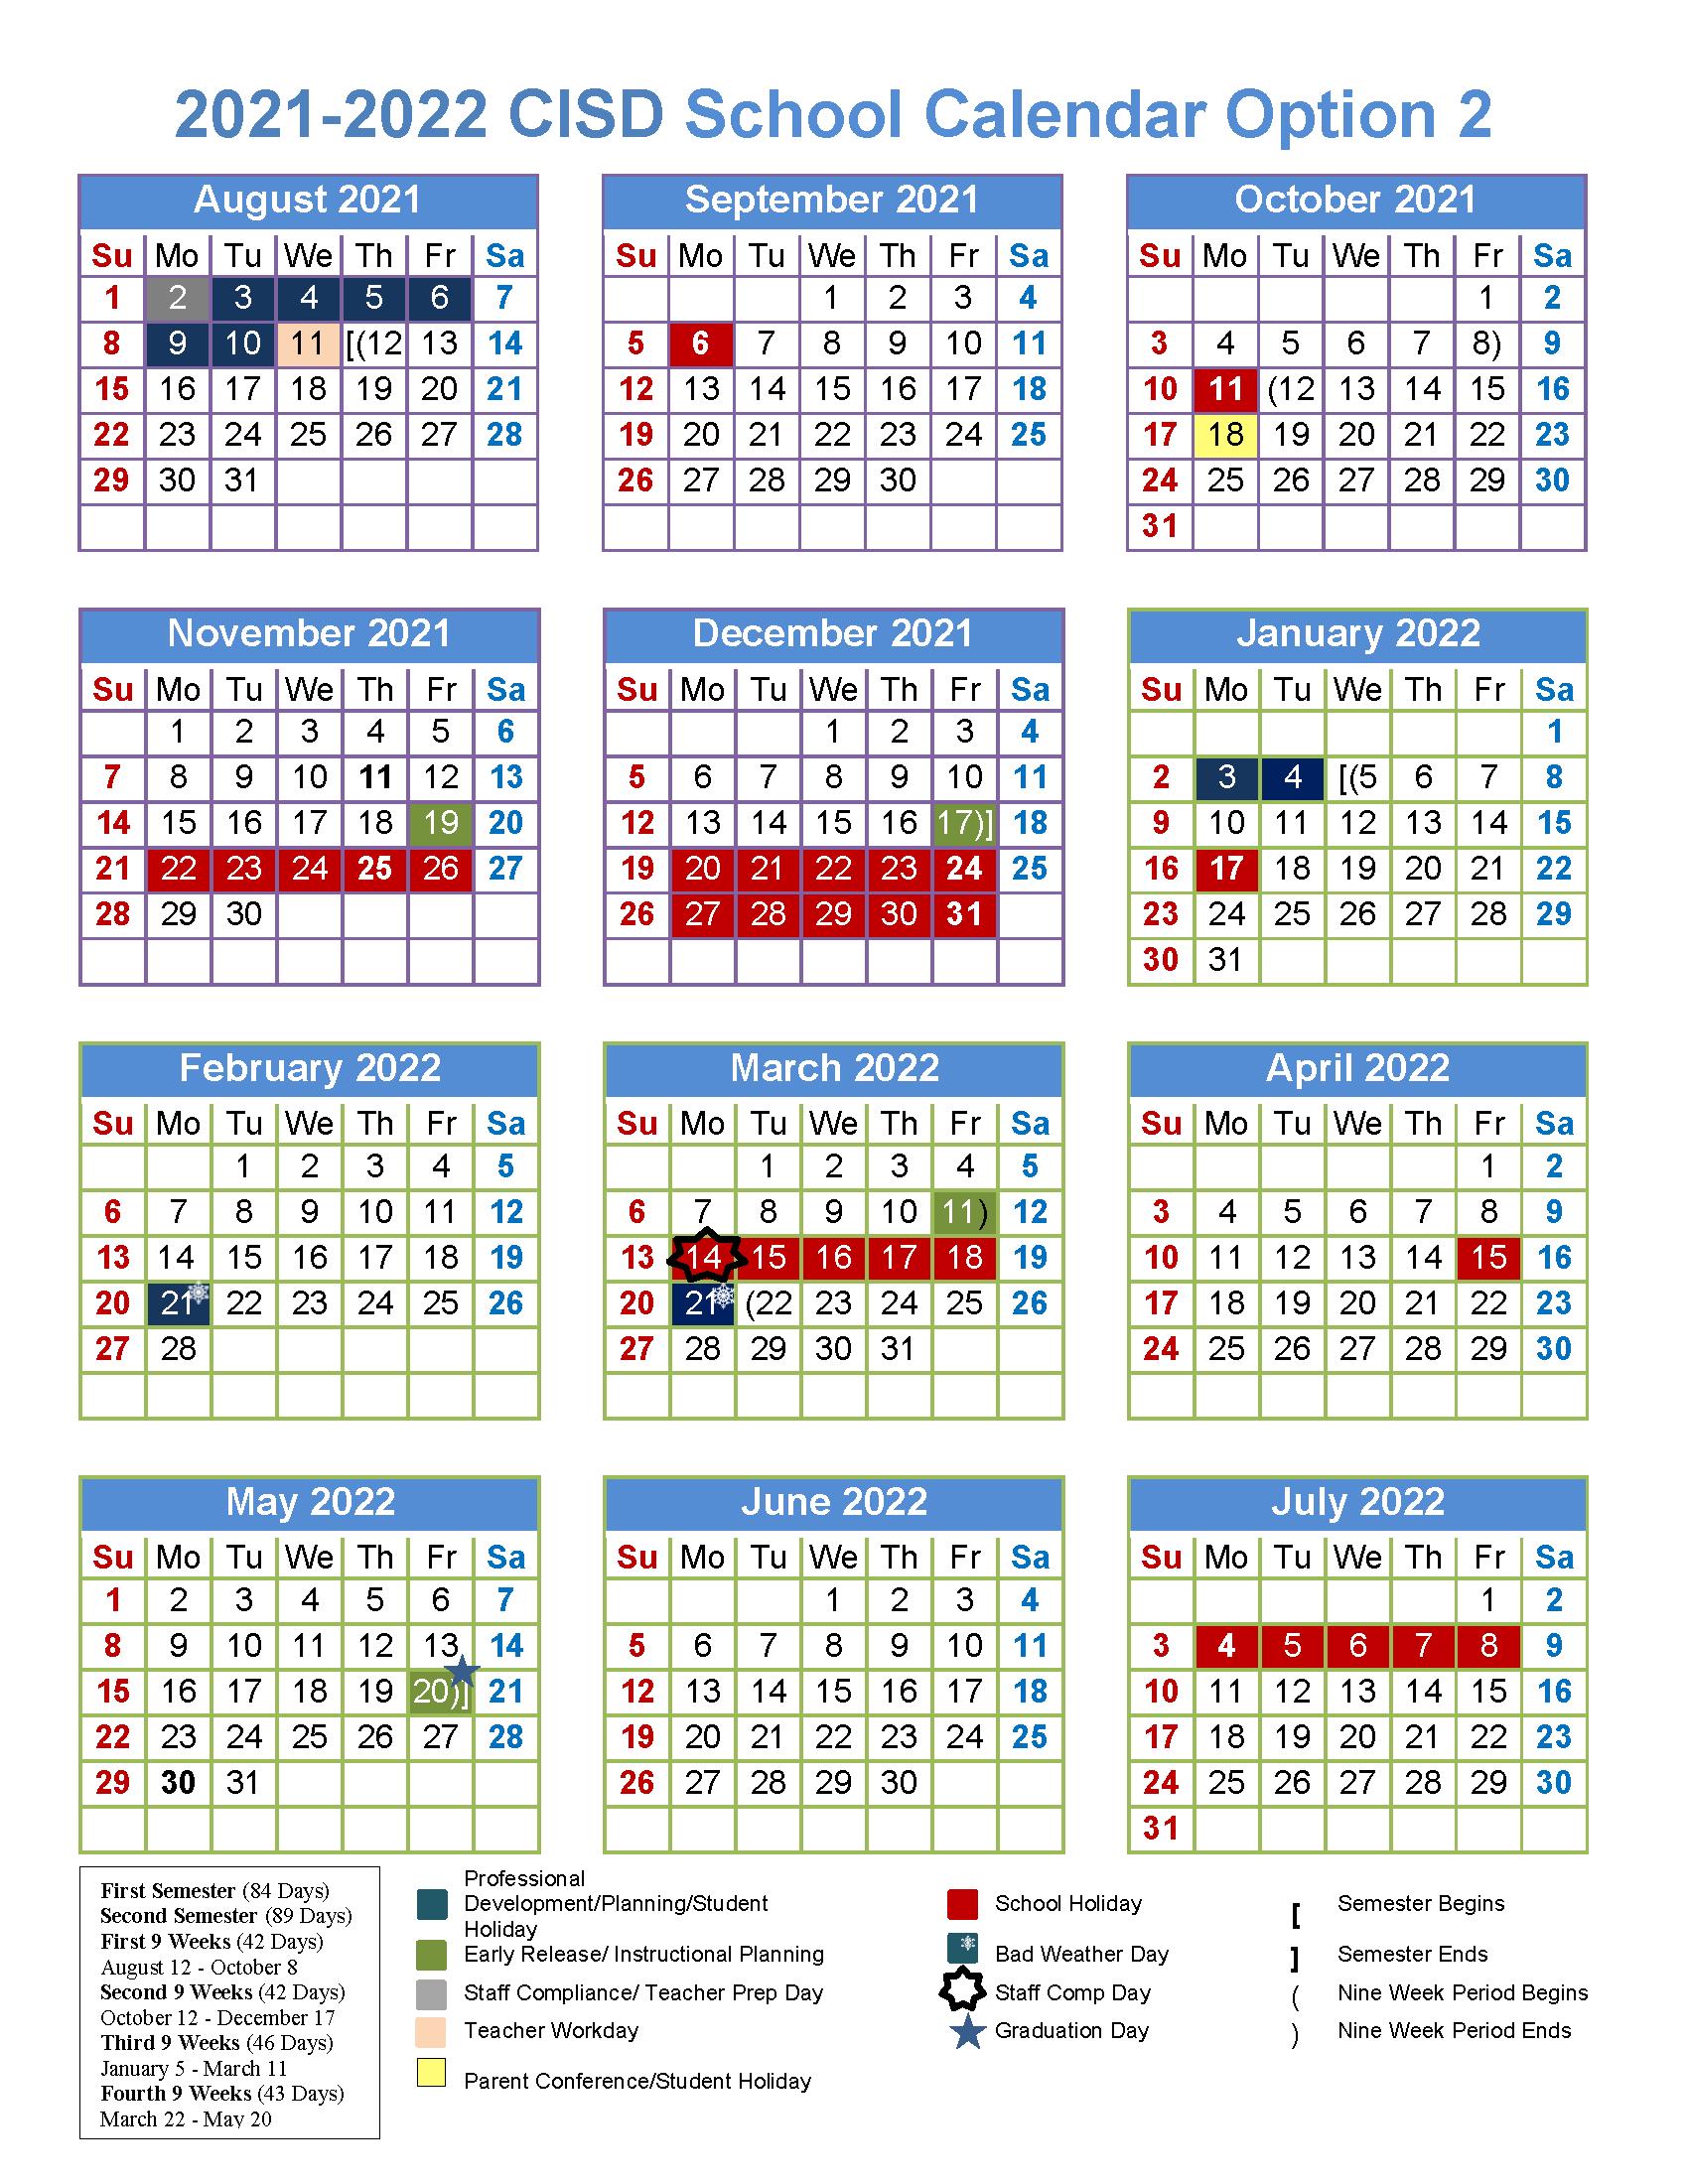 Guilford County Schools Calendar 2022.G U I L F O R D C O U N T Y 2 0 2 1 2 0 2 2 C A L E N D A R Zonealarm Results